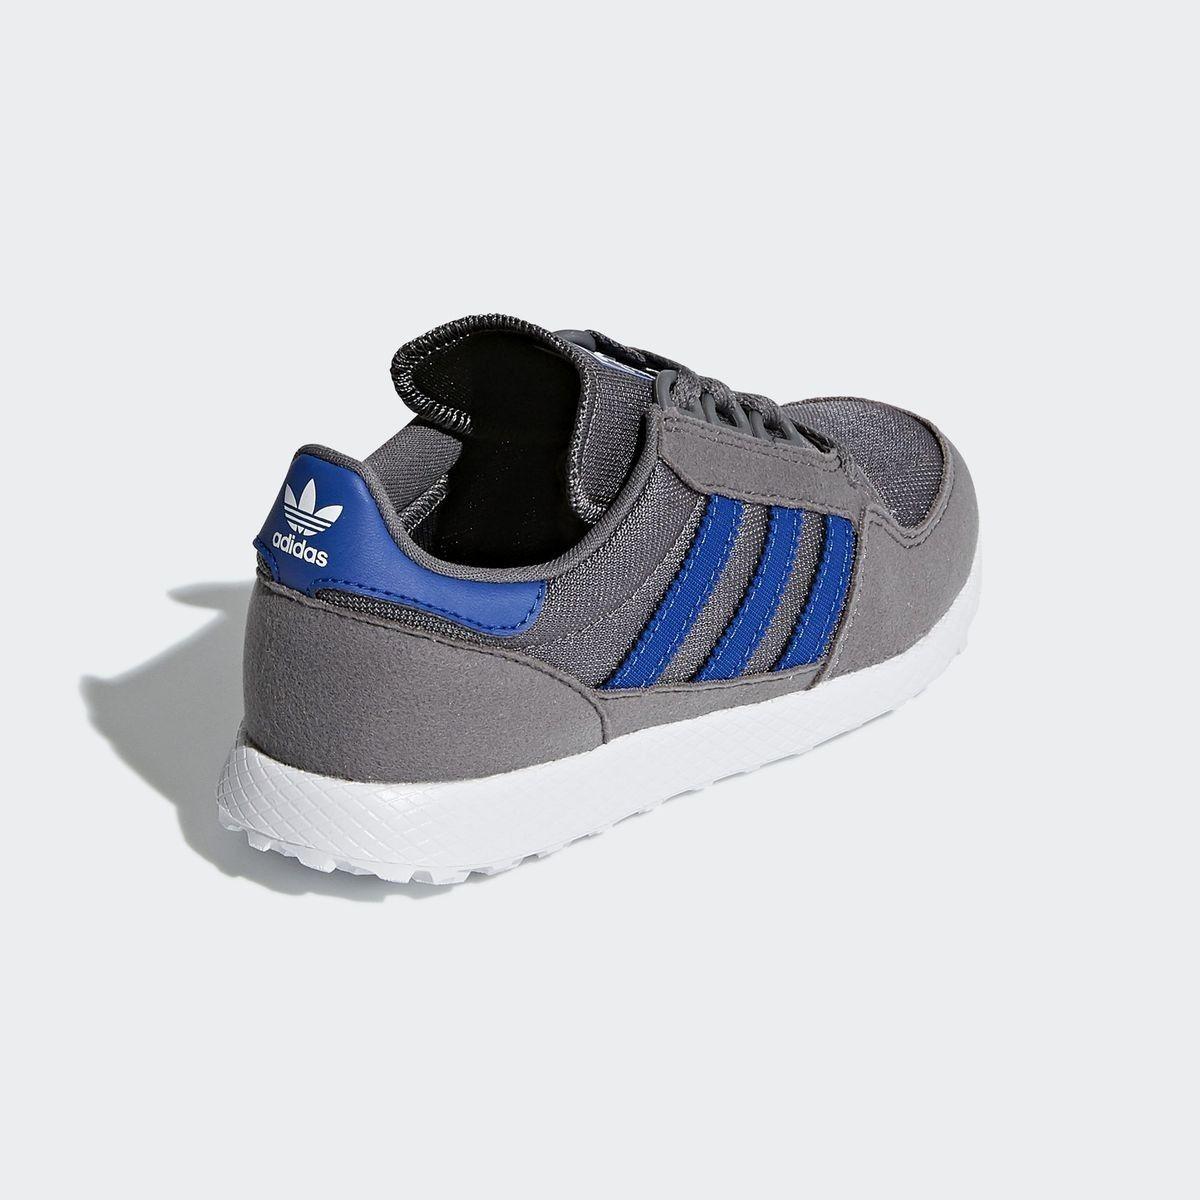 chaussure adidas enfant 28